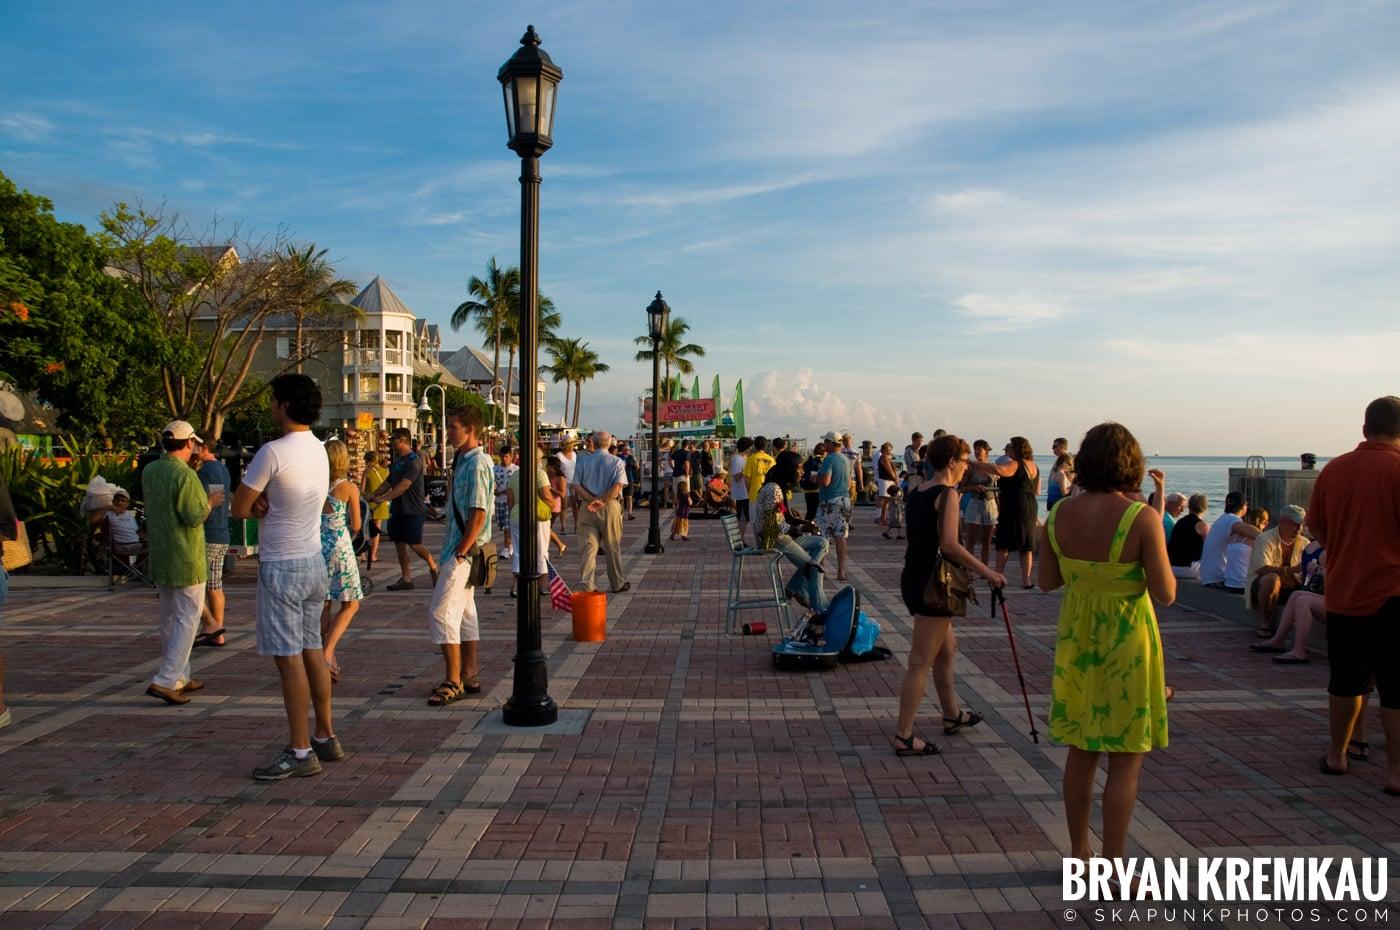 Florida Keys Vacation - 7.09.10 - 7.15.10 (27)